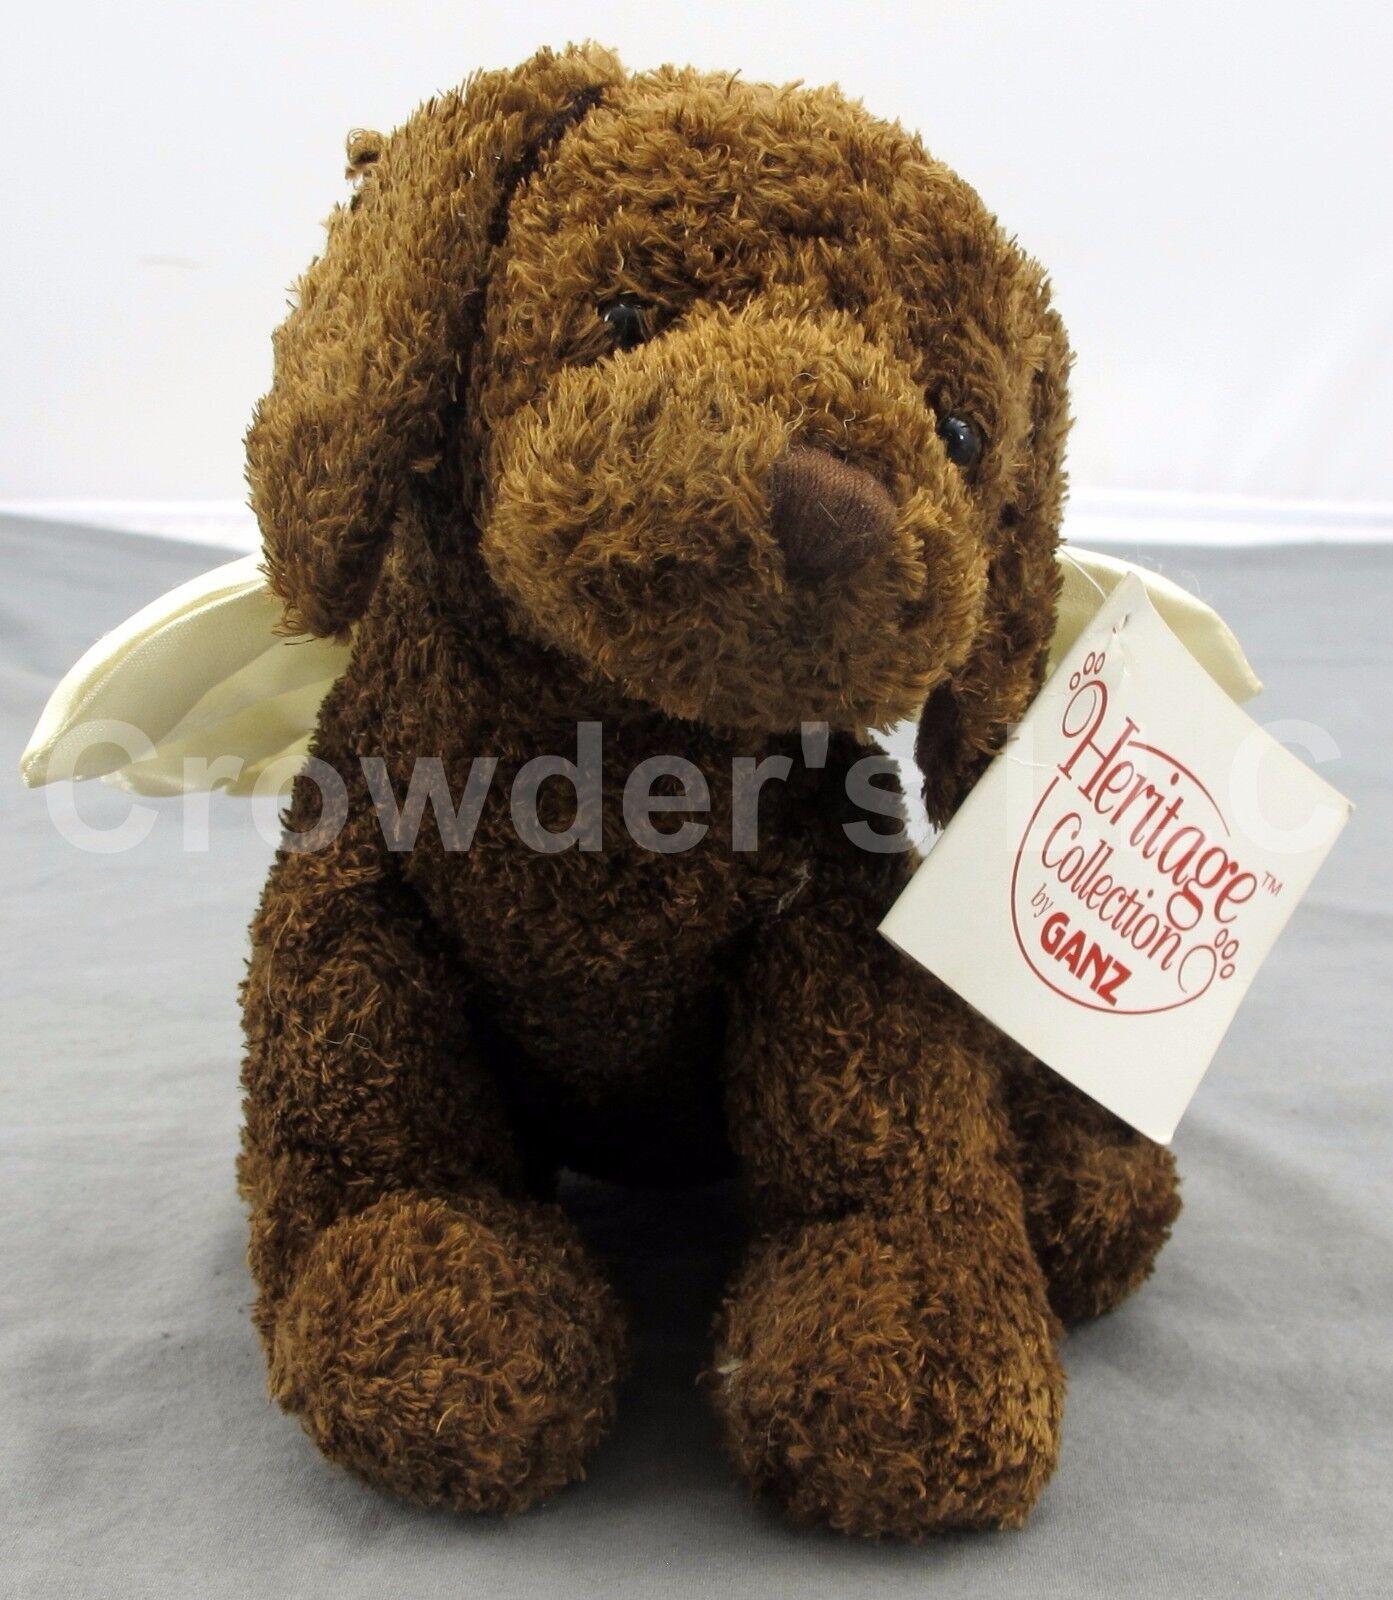 RARE Vintage Heritage Collection by Ganz Soft Spot Angel 2001 Stuffed Braun Dog